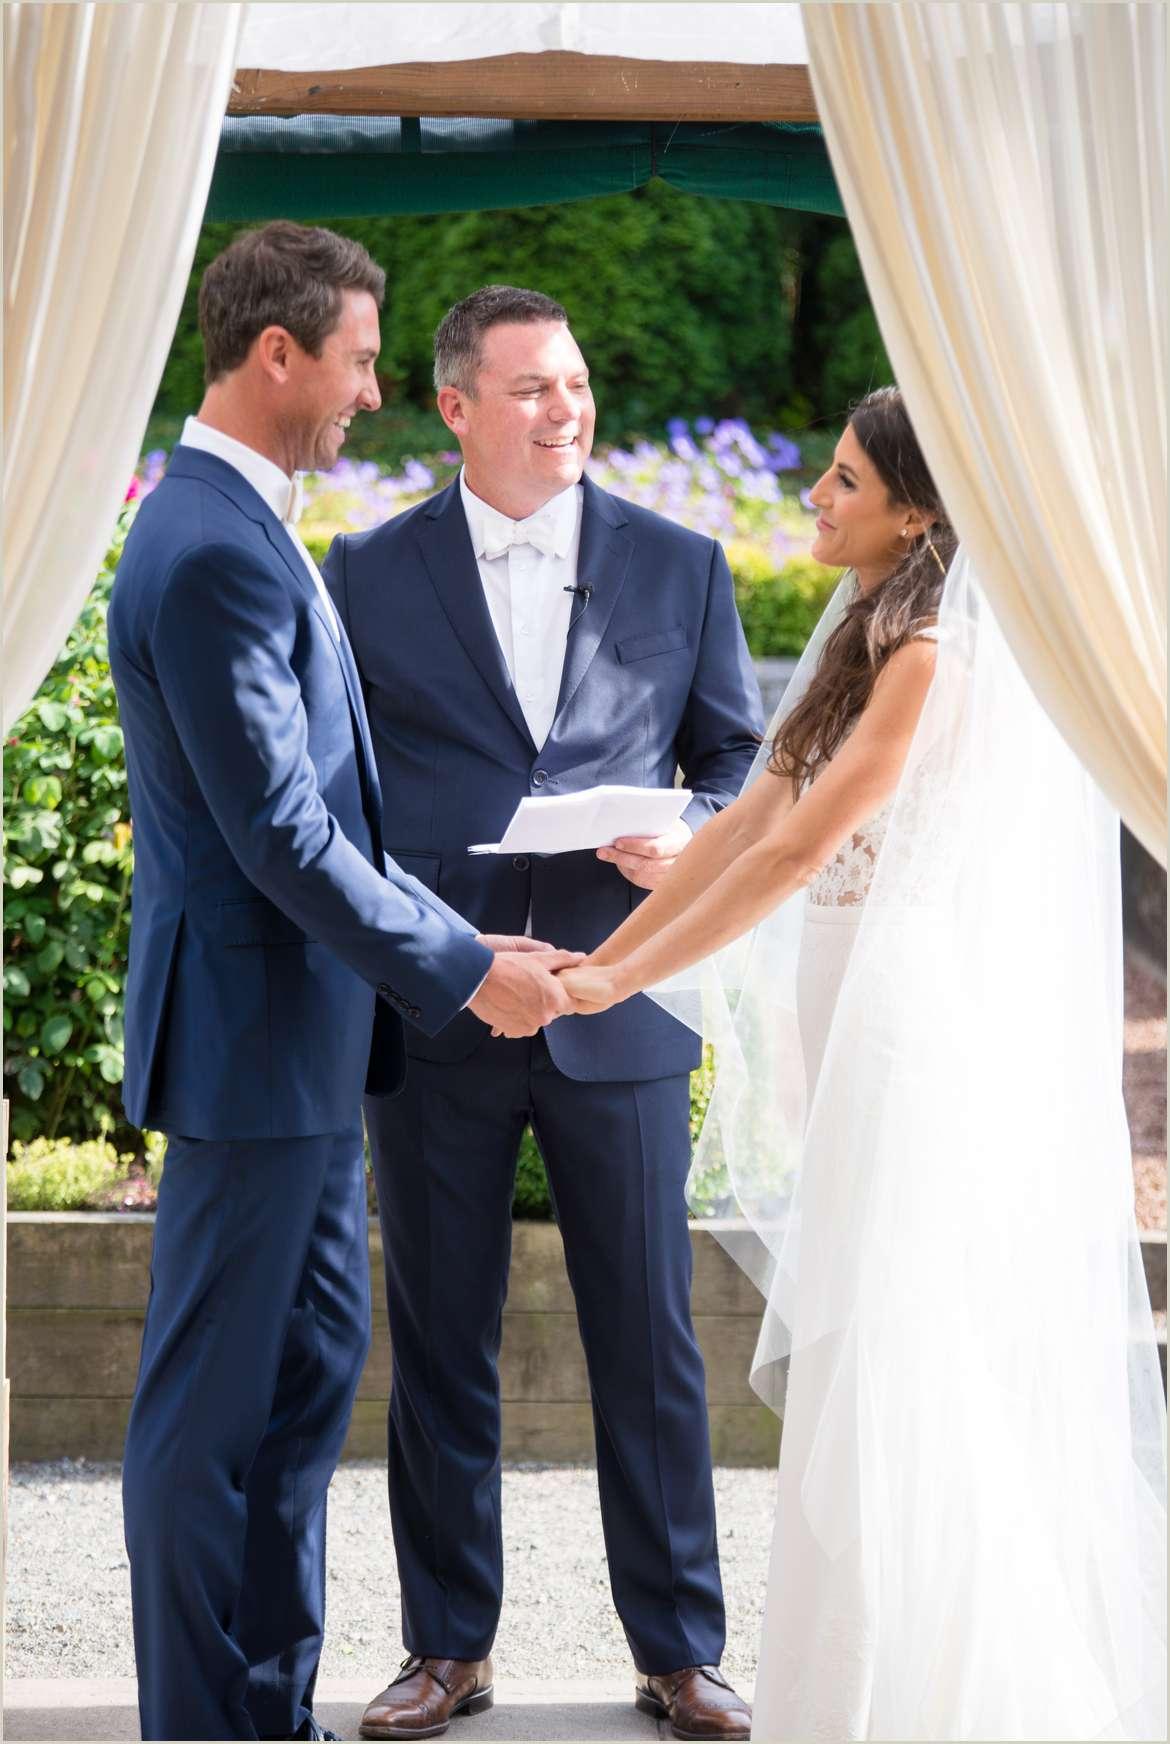 woodinville wedding ceremony